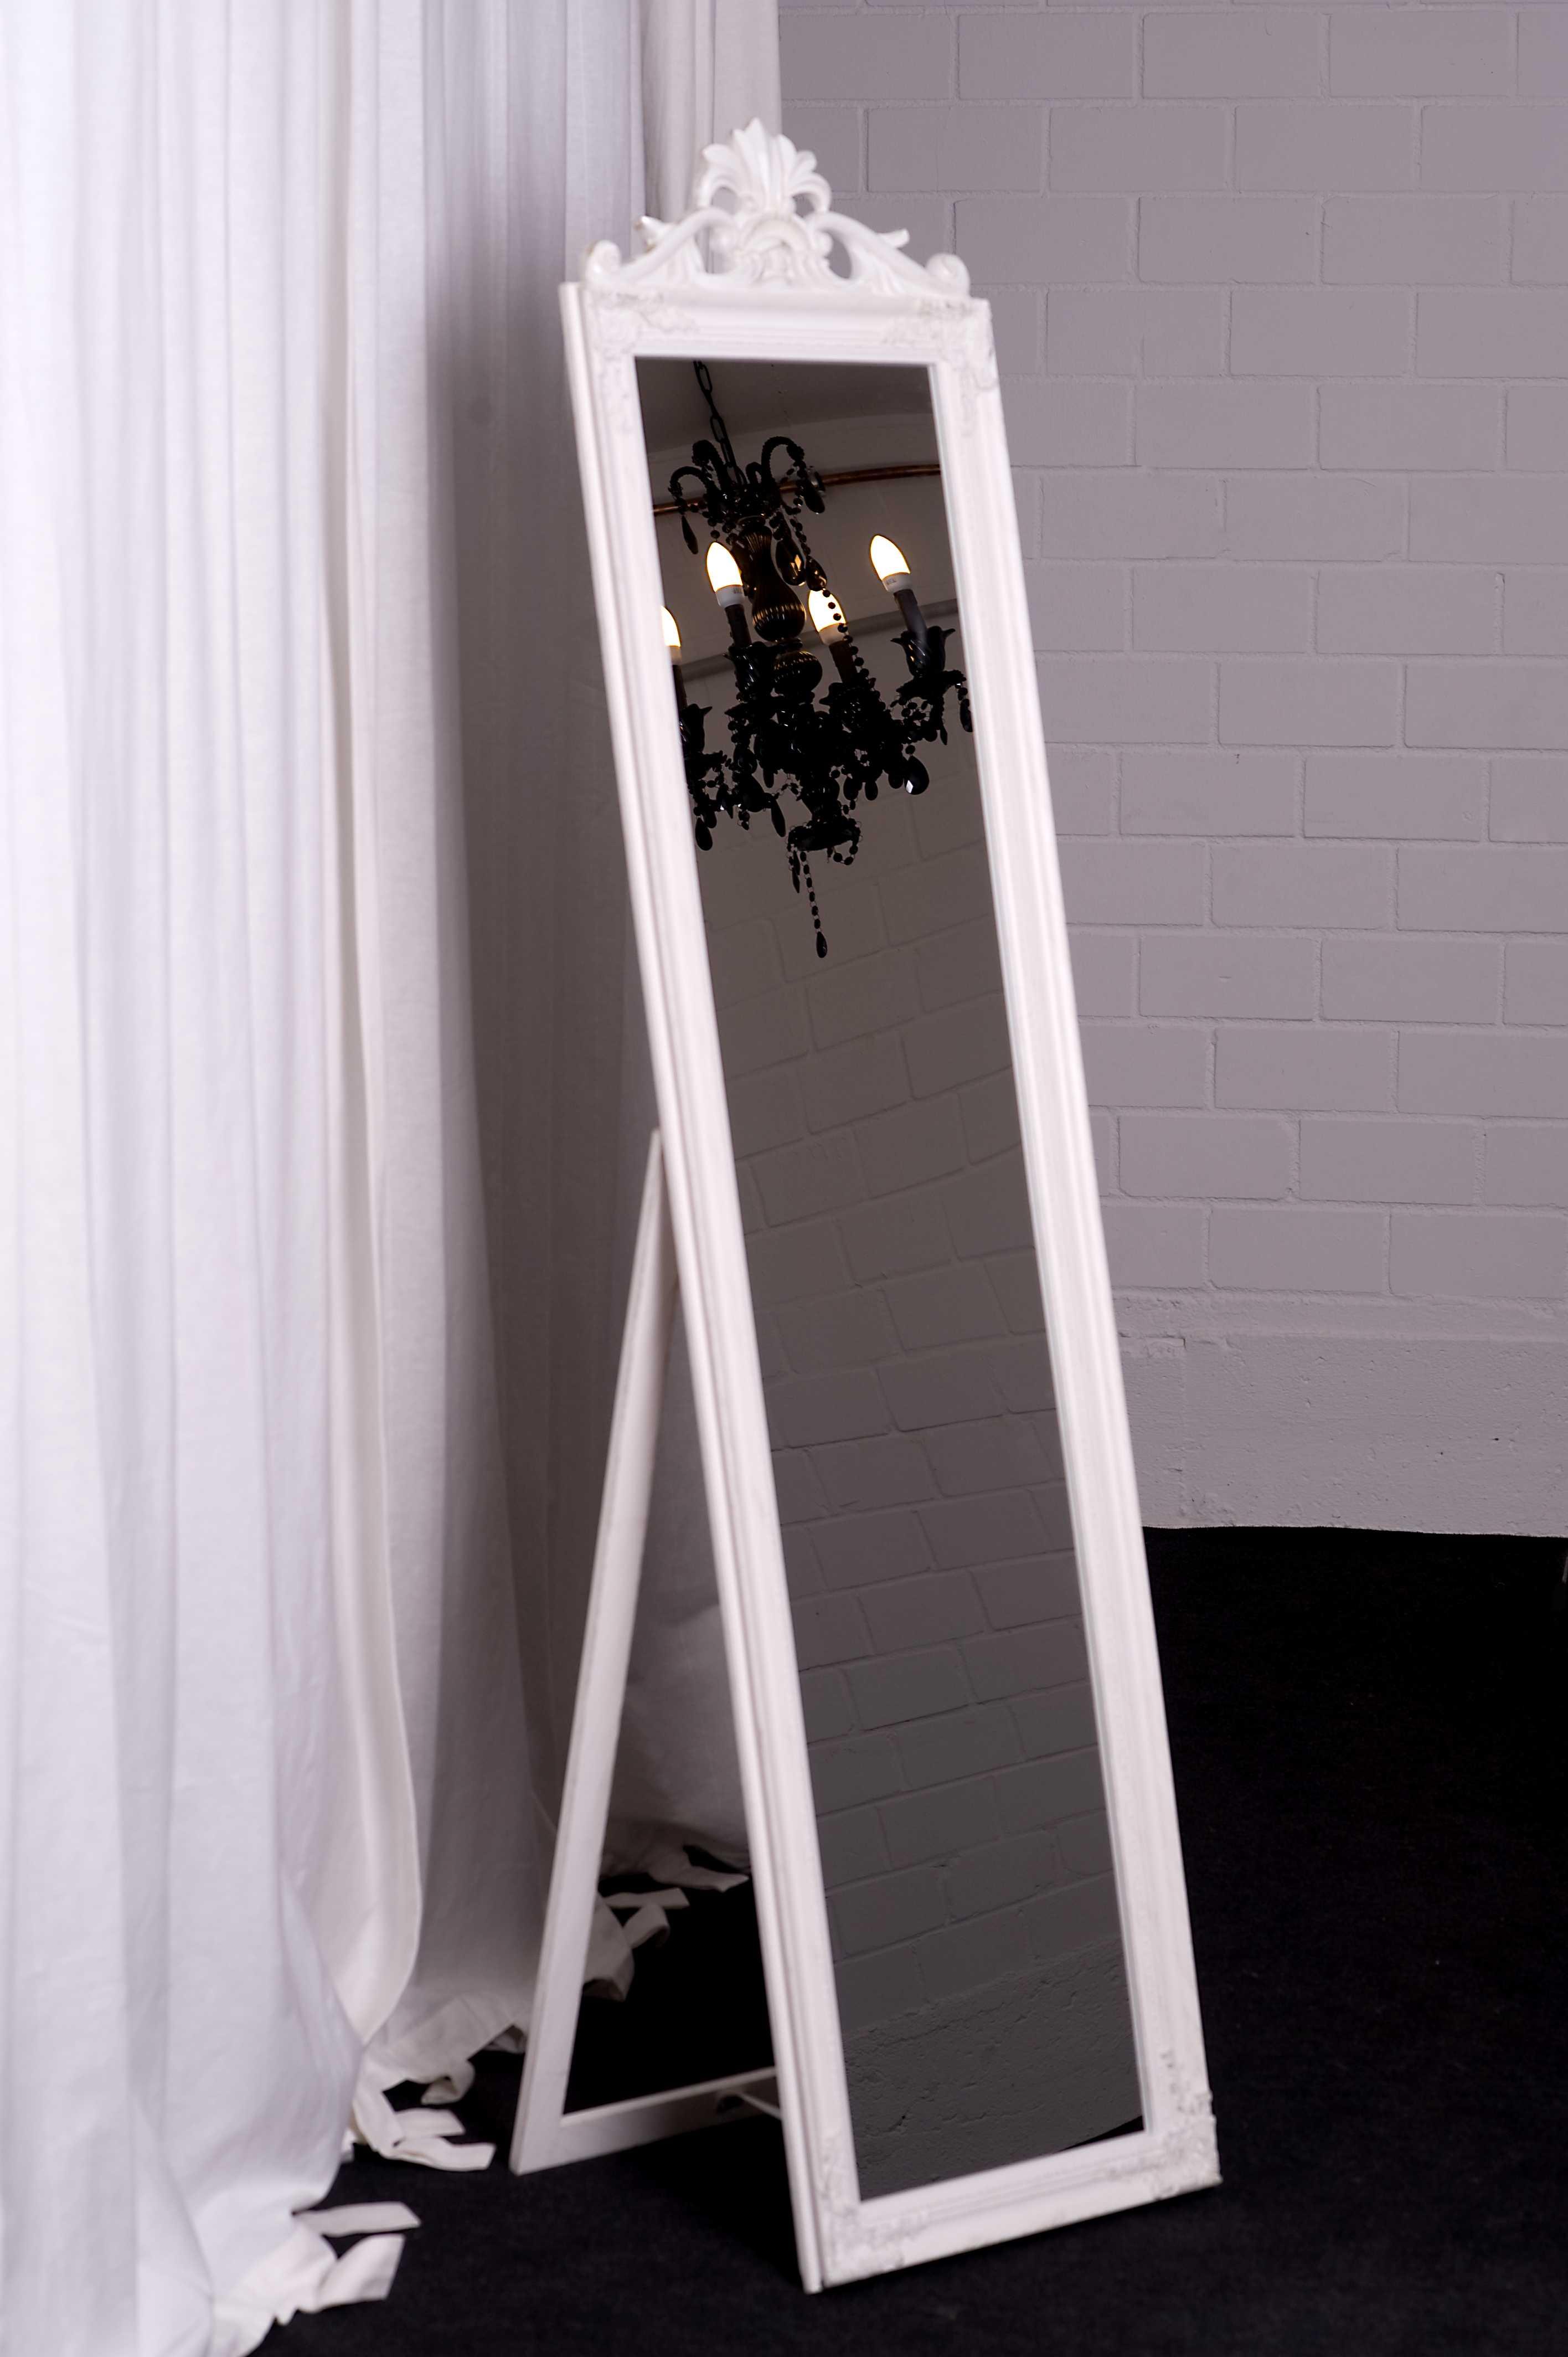 standspiegel 180 x 45 cm barock antik wandspiegel spiegel landhaus ebay. Black Bedroom Furniture Sets. Home Design Ideas